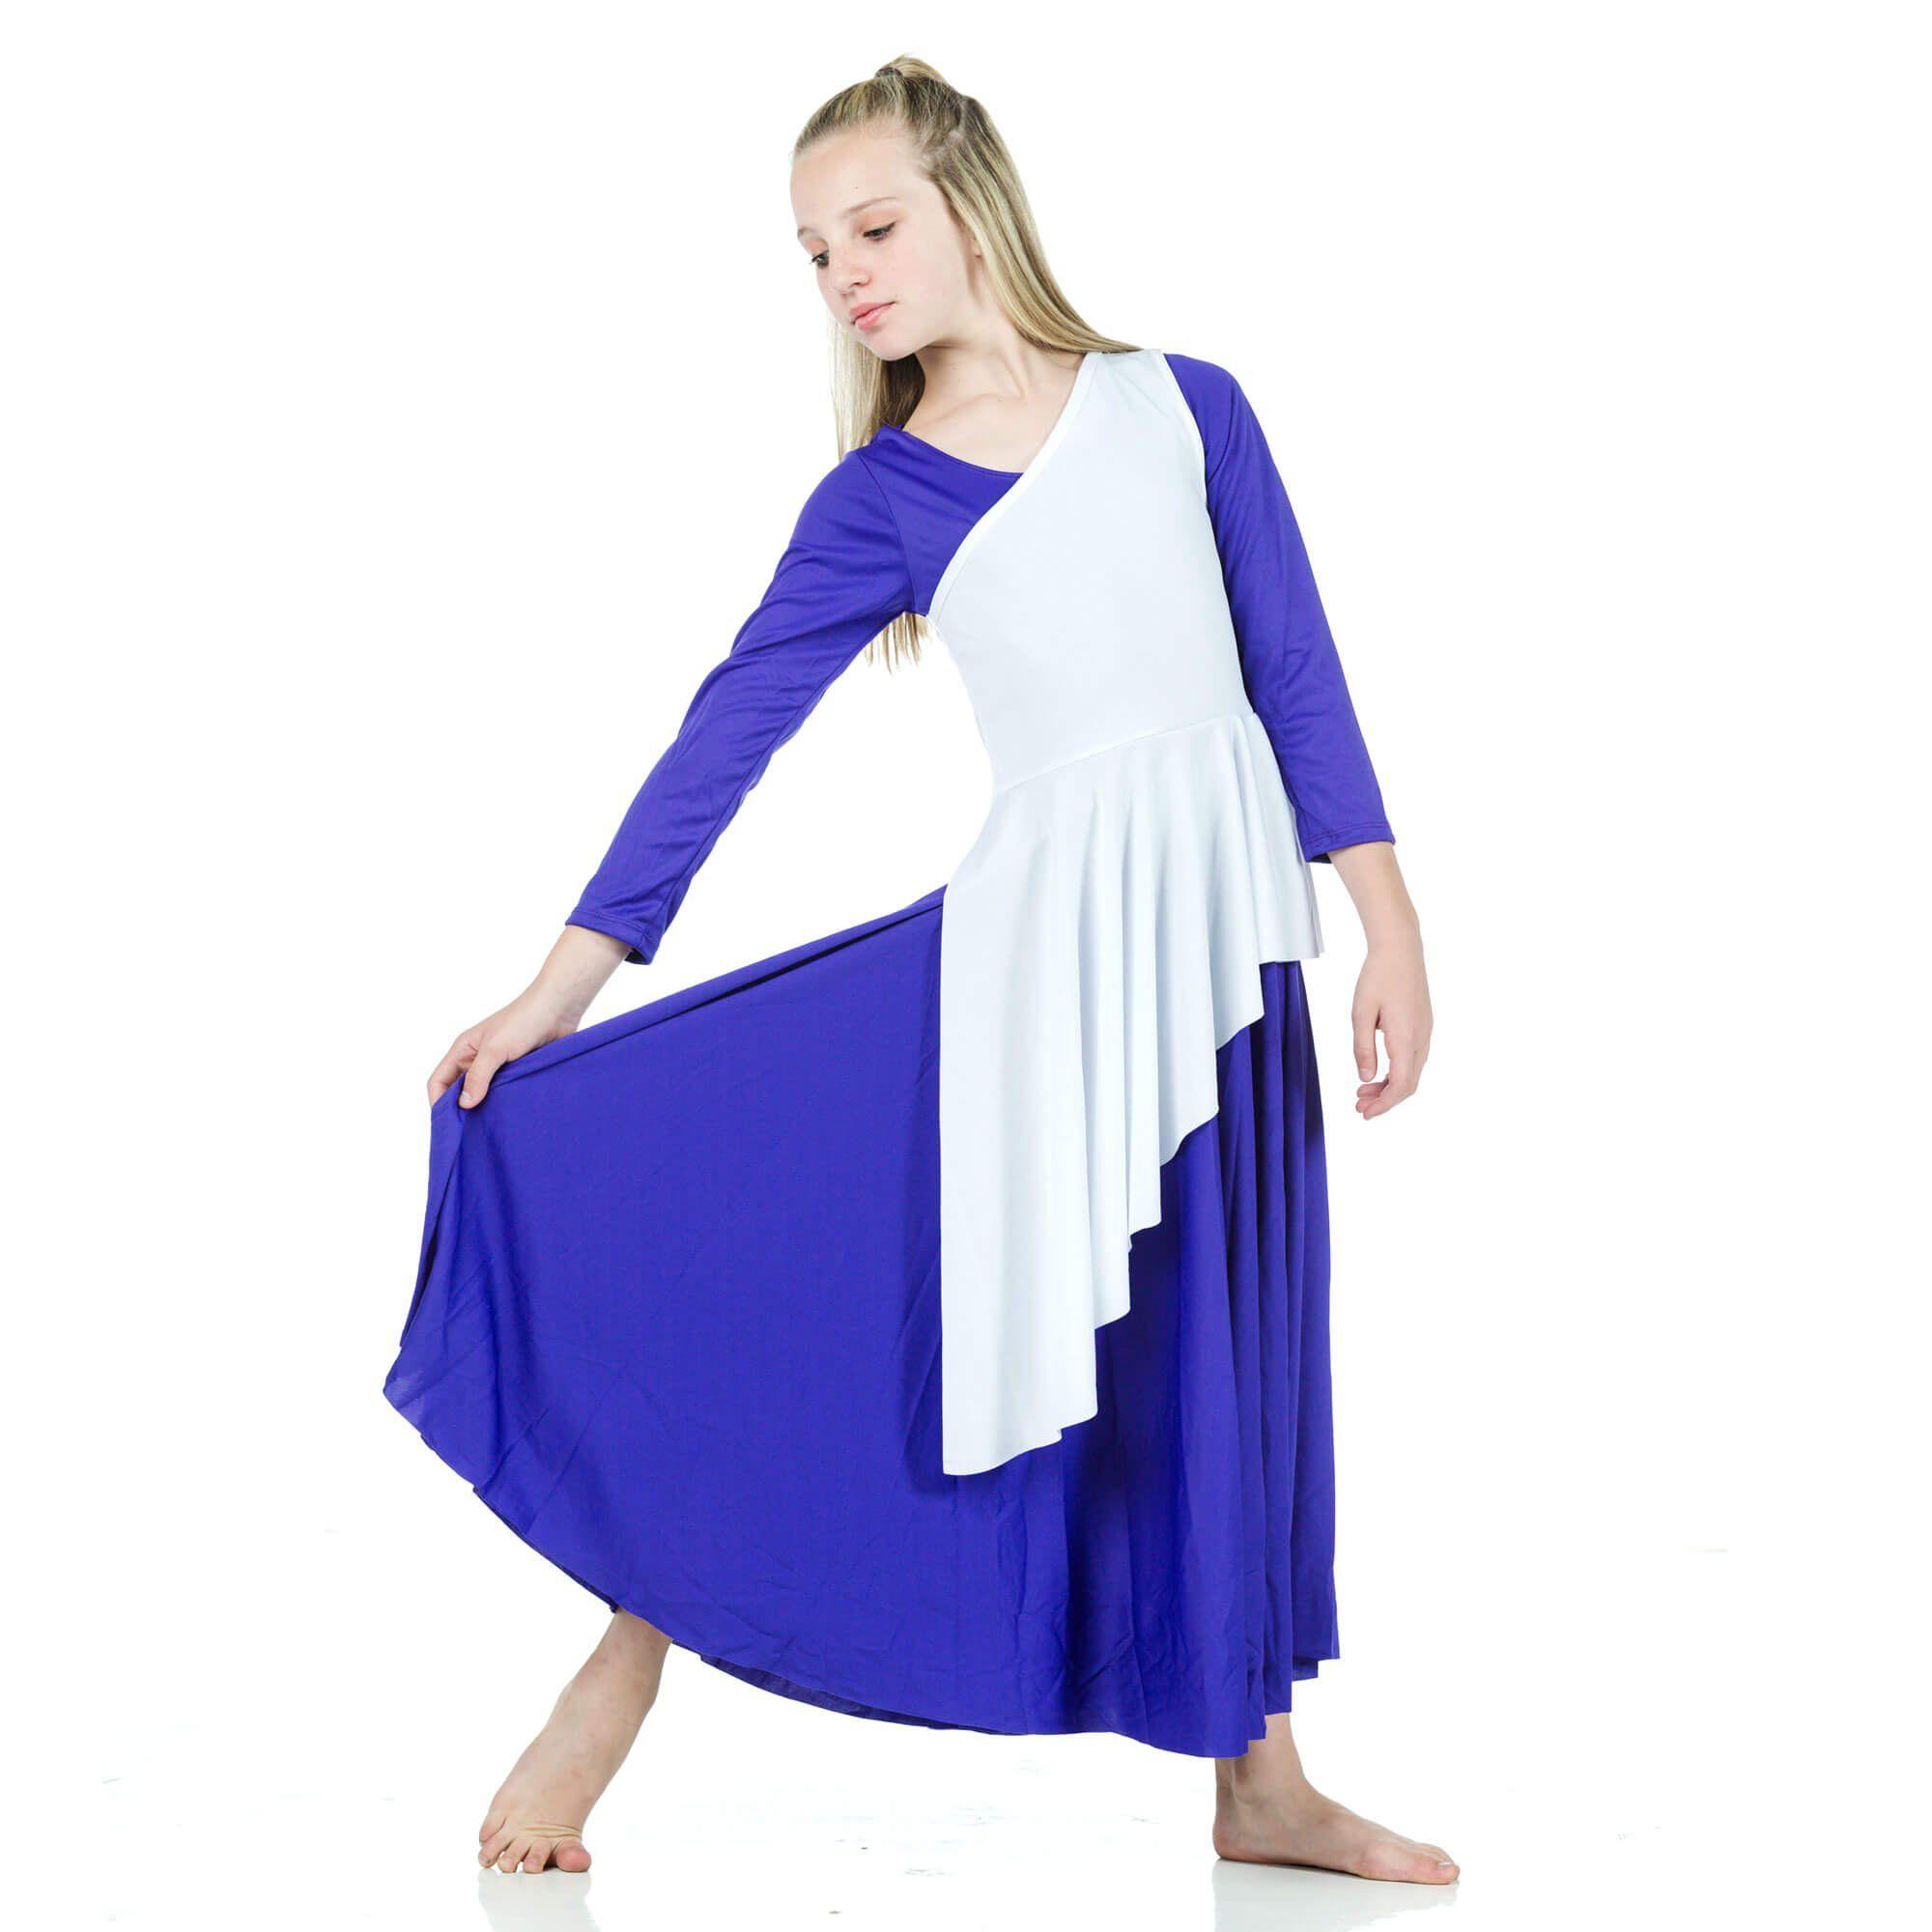 Danzcue Asymmetrical Praise Dance Tunic Dress Not Included Danzcue Wst517 Tops Worship Dancewear Spon D Tunic Dress Style Inspiration Casual Dresses